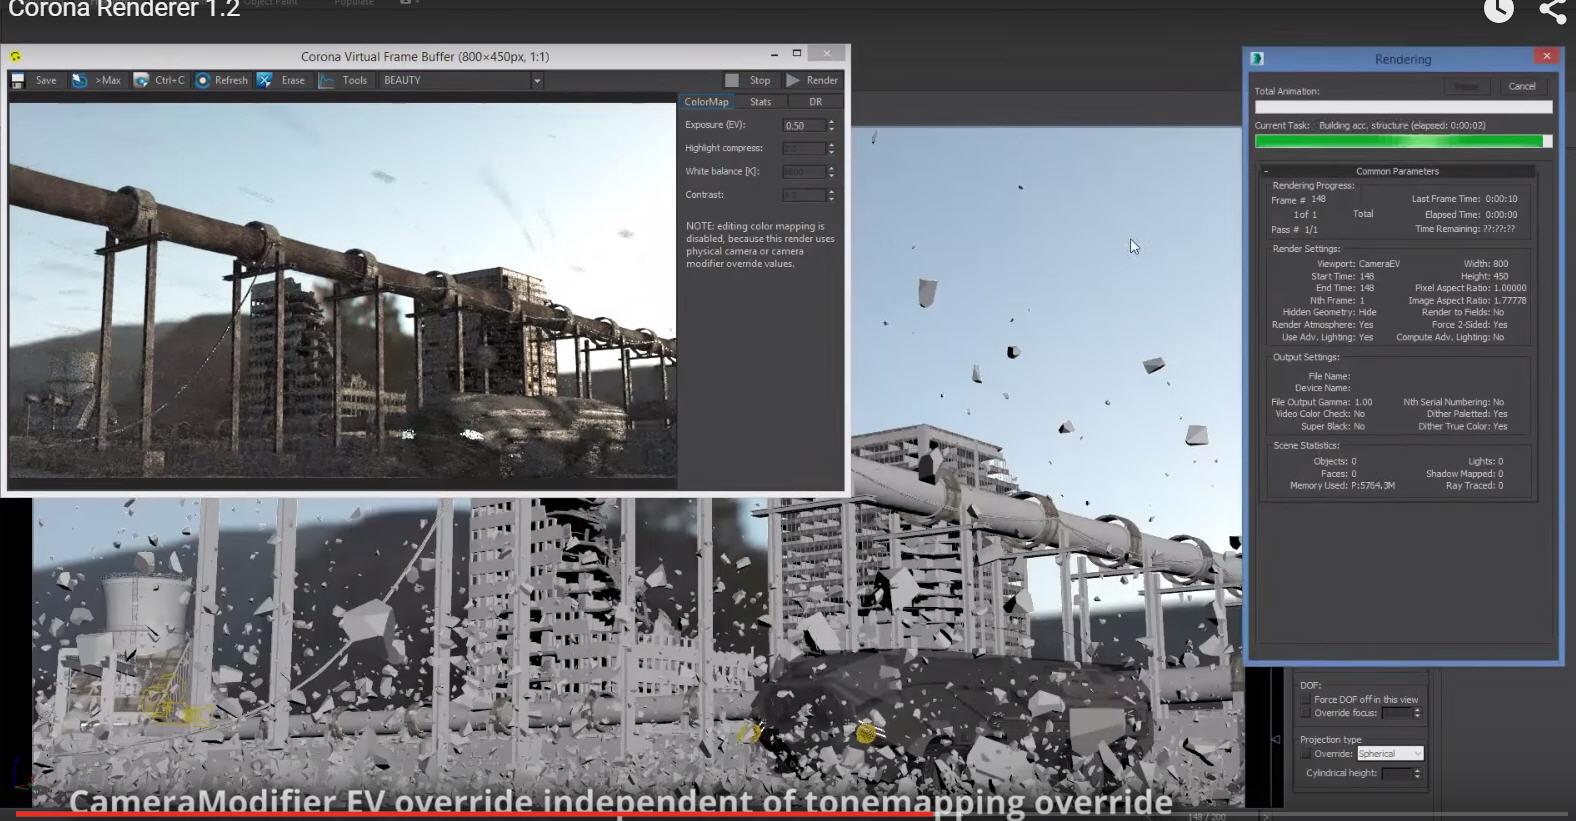 Corona renderer v1 3 for 3ds max 2011 2016 crackingpatching for 3d studio max torrent